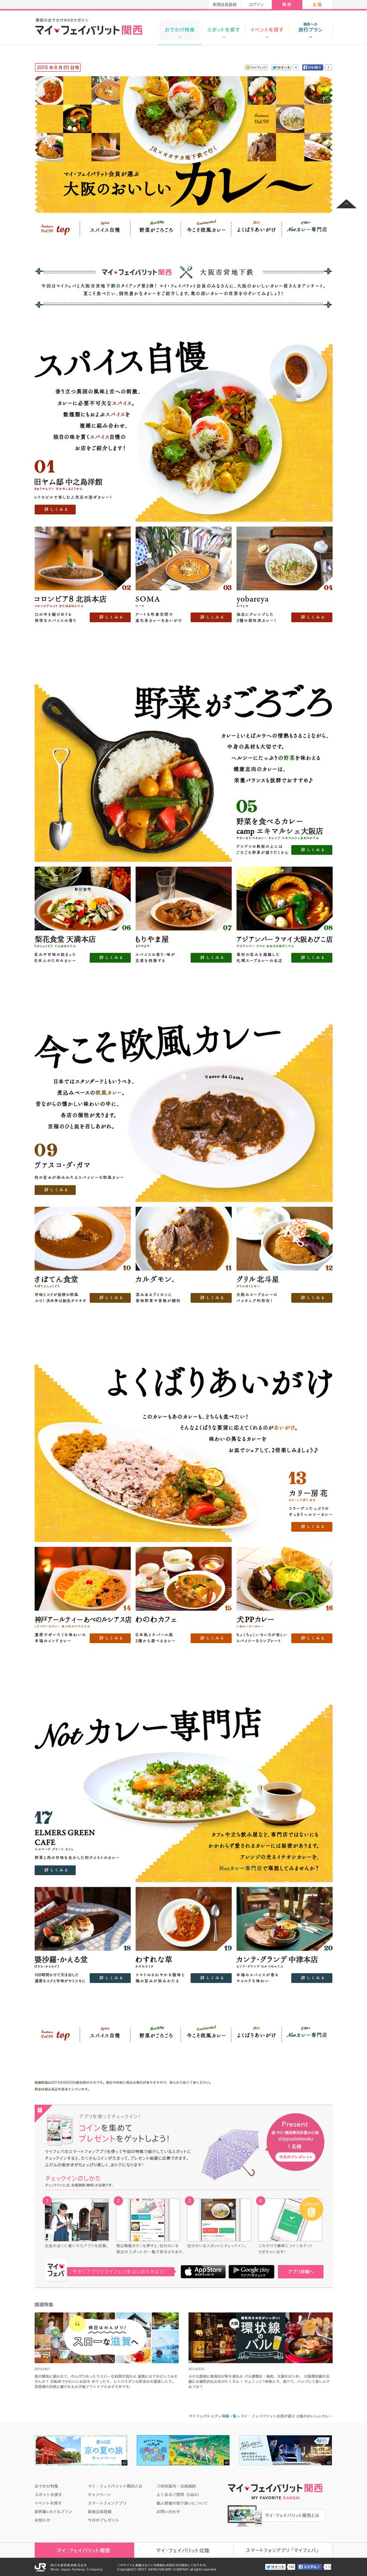 http://www.my-fav.jp/feature/98/